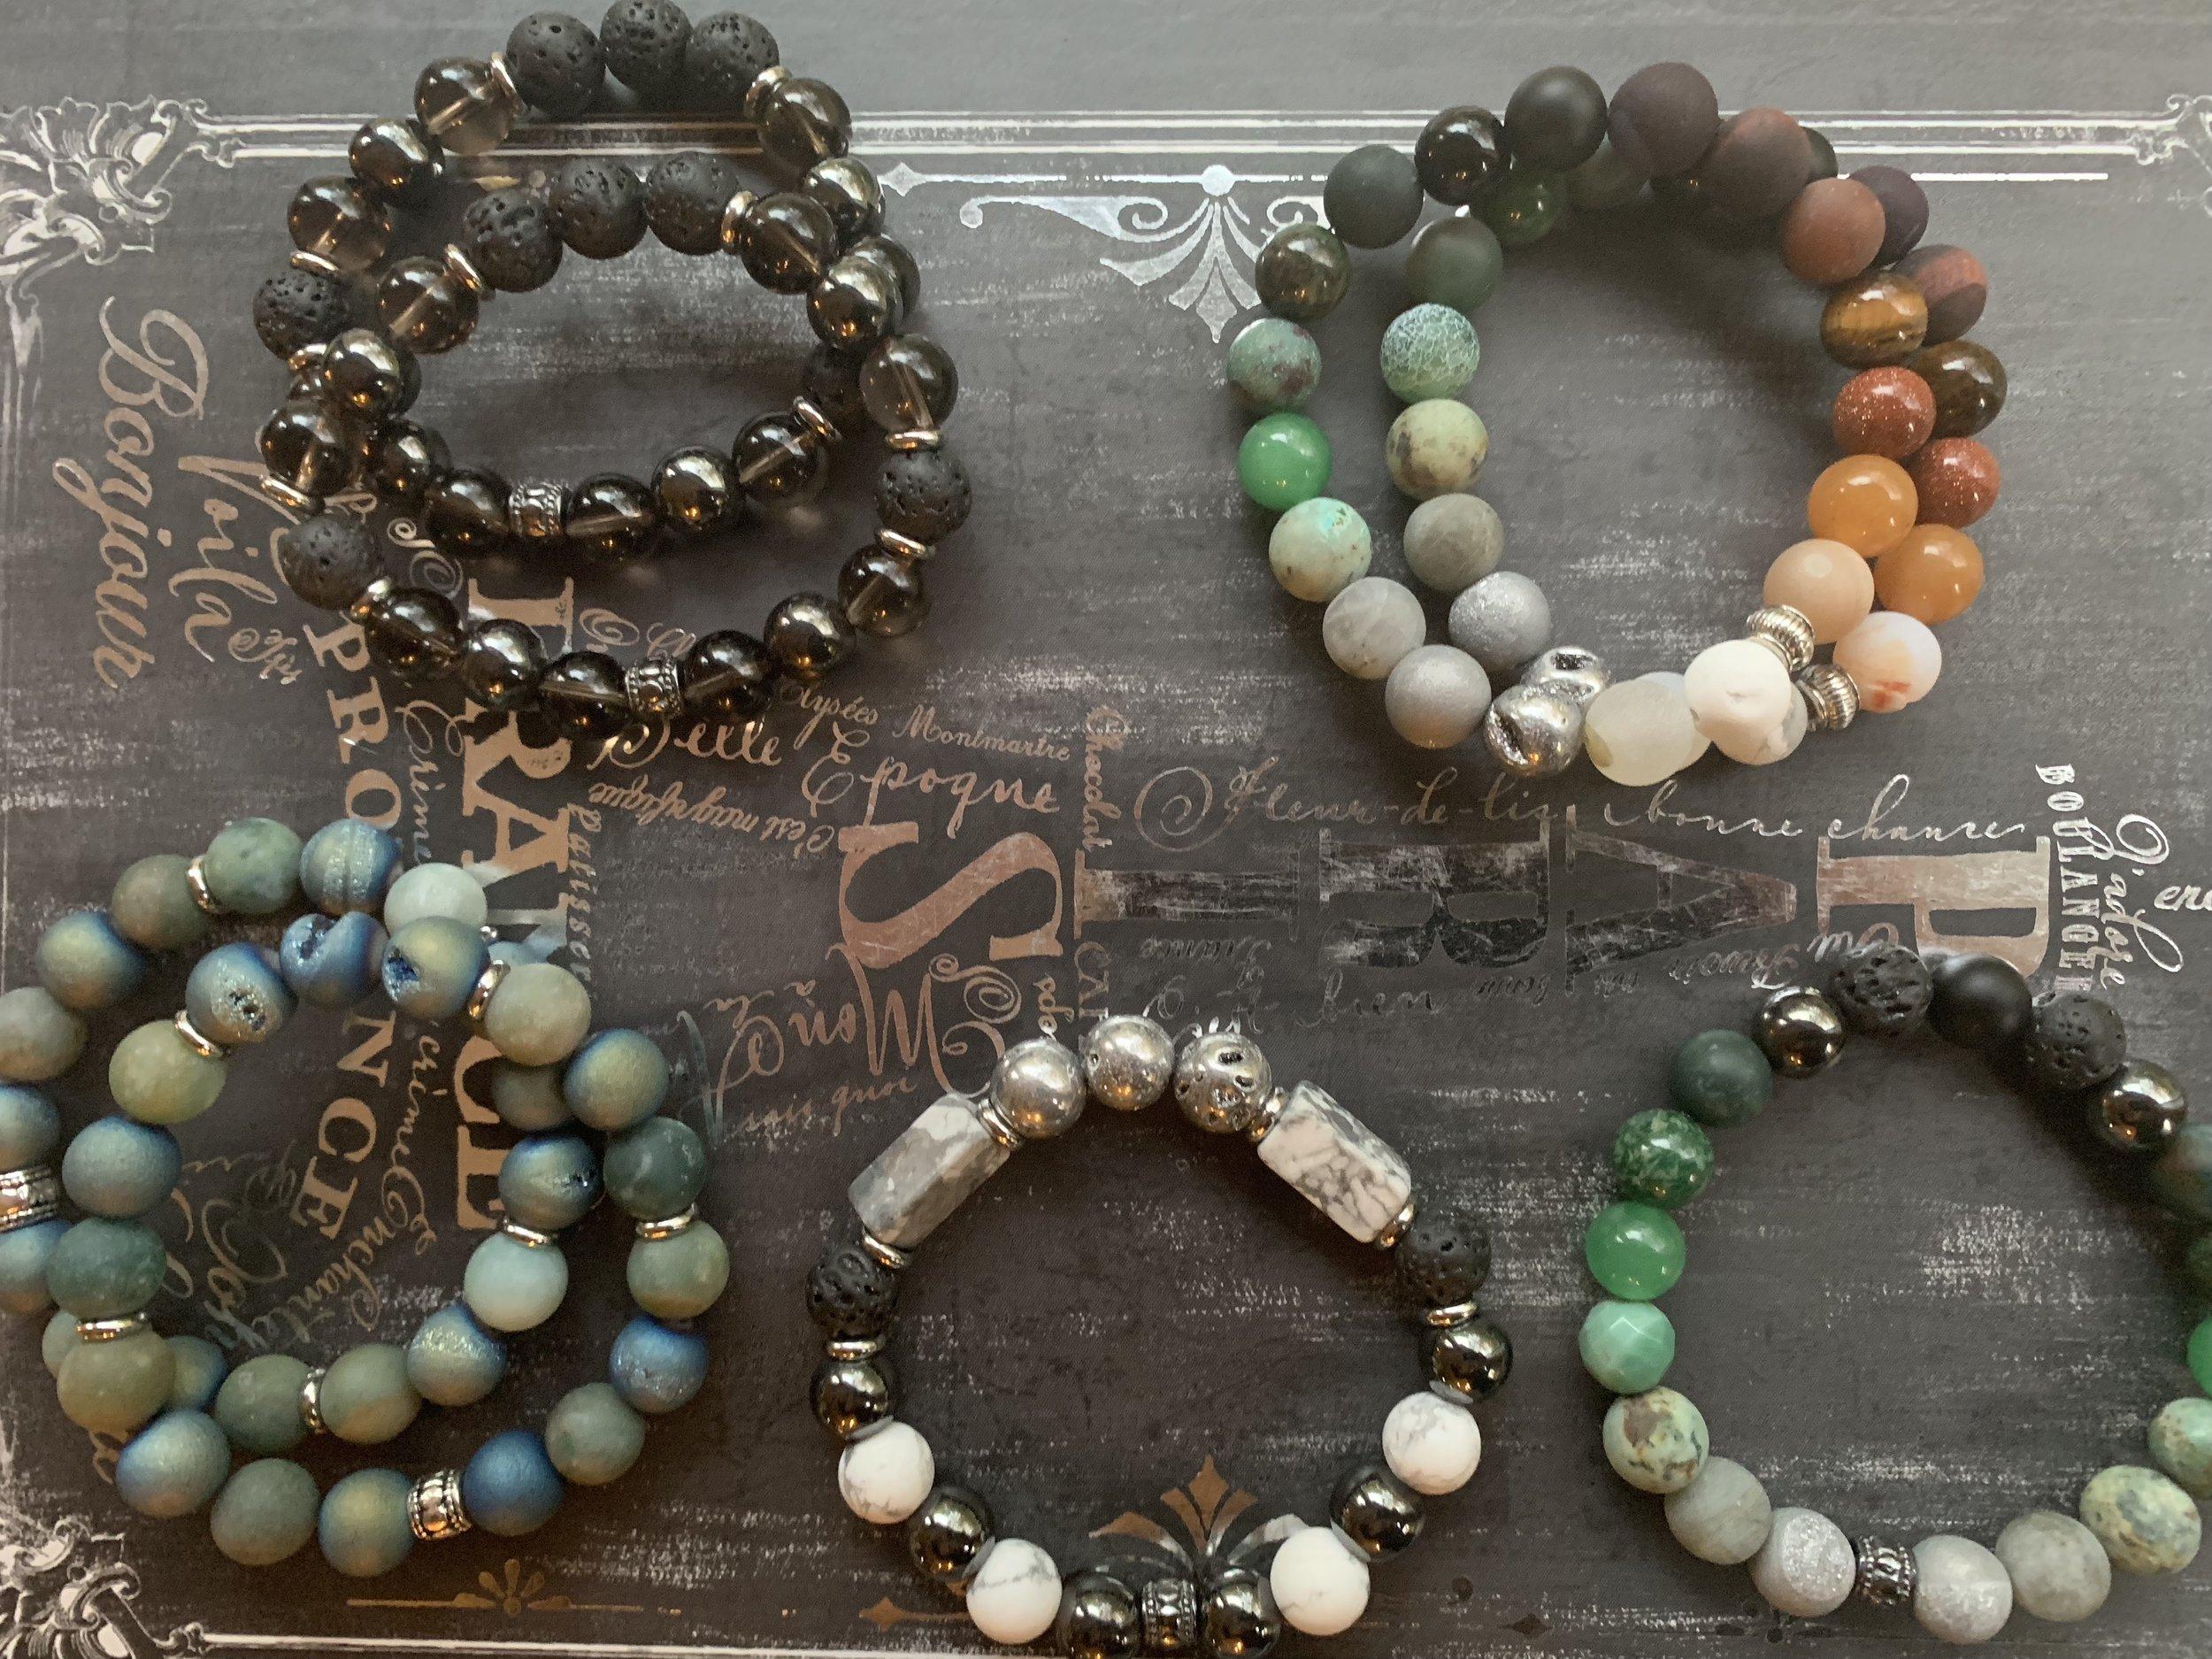 Healing/Energy Bracelets